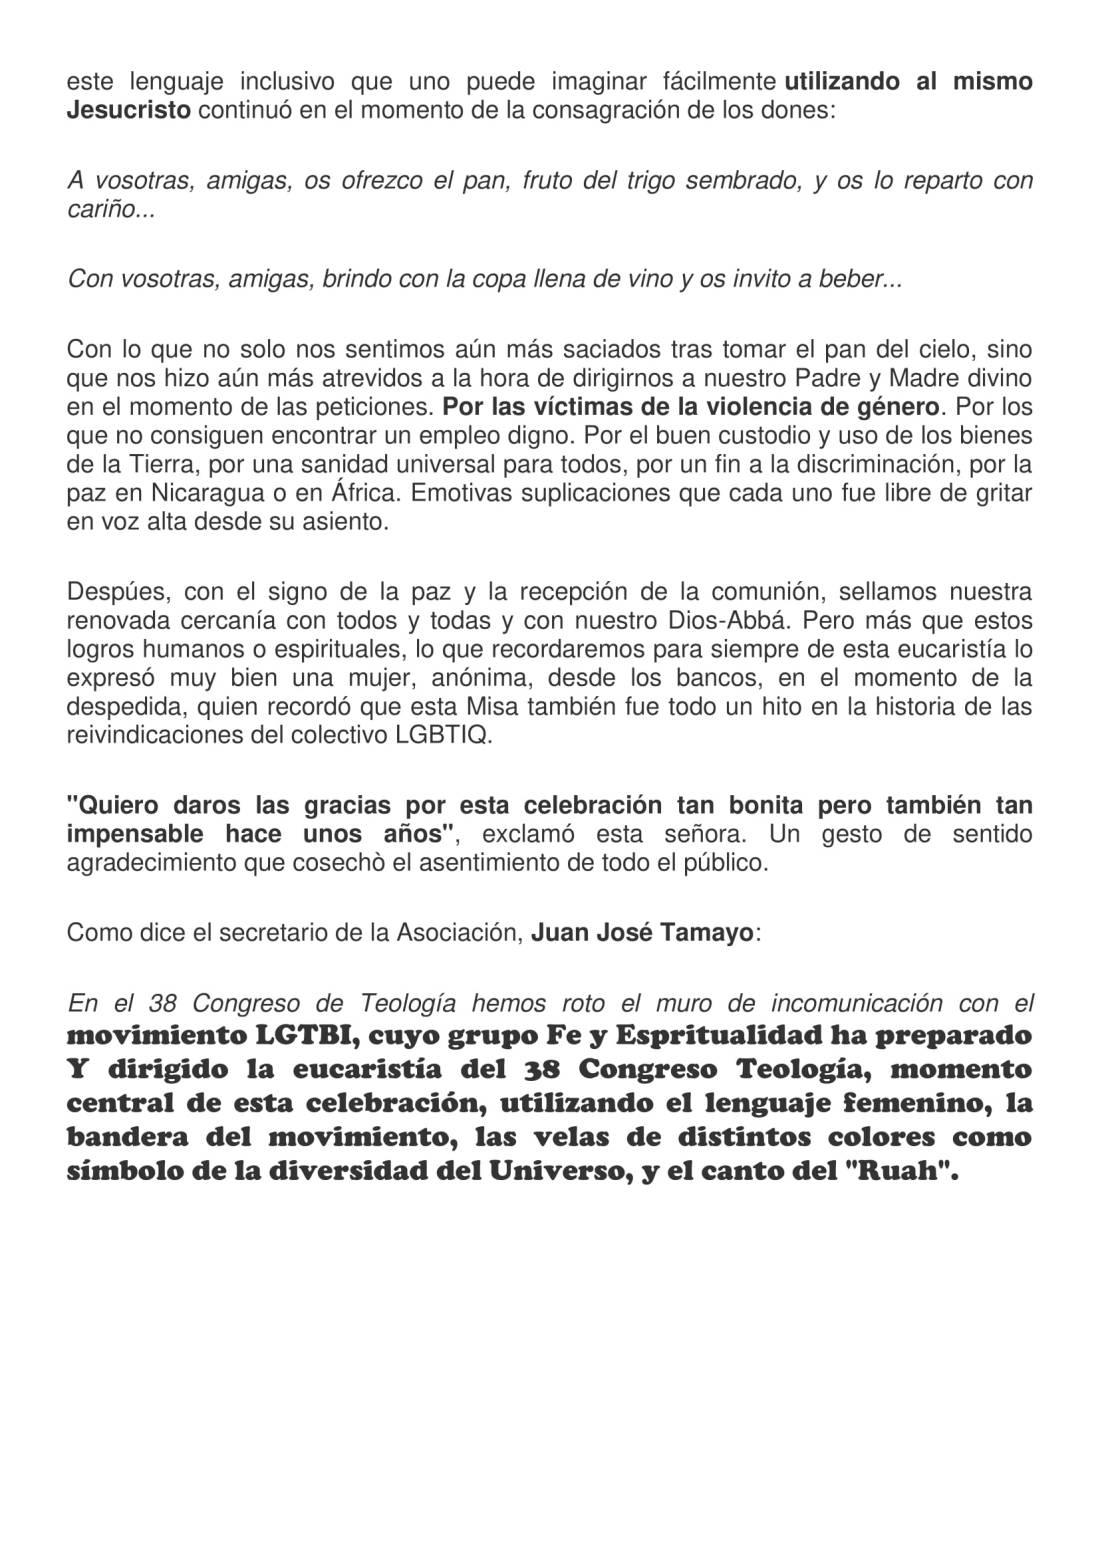 DE ESCÁNDALO EN ESCÁNDALO-4